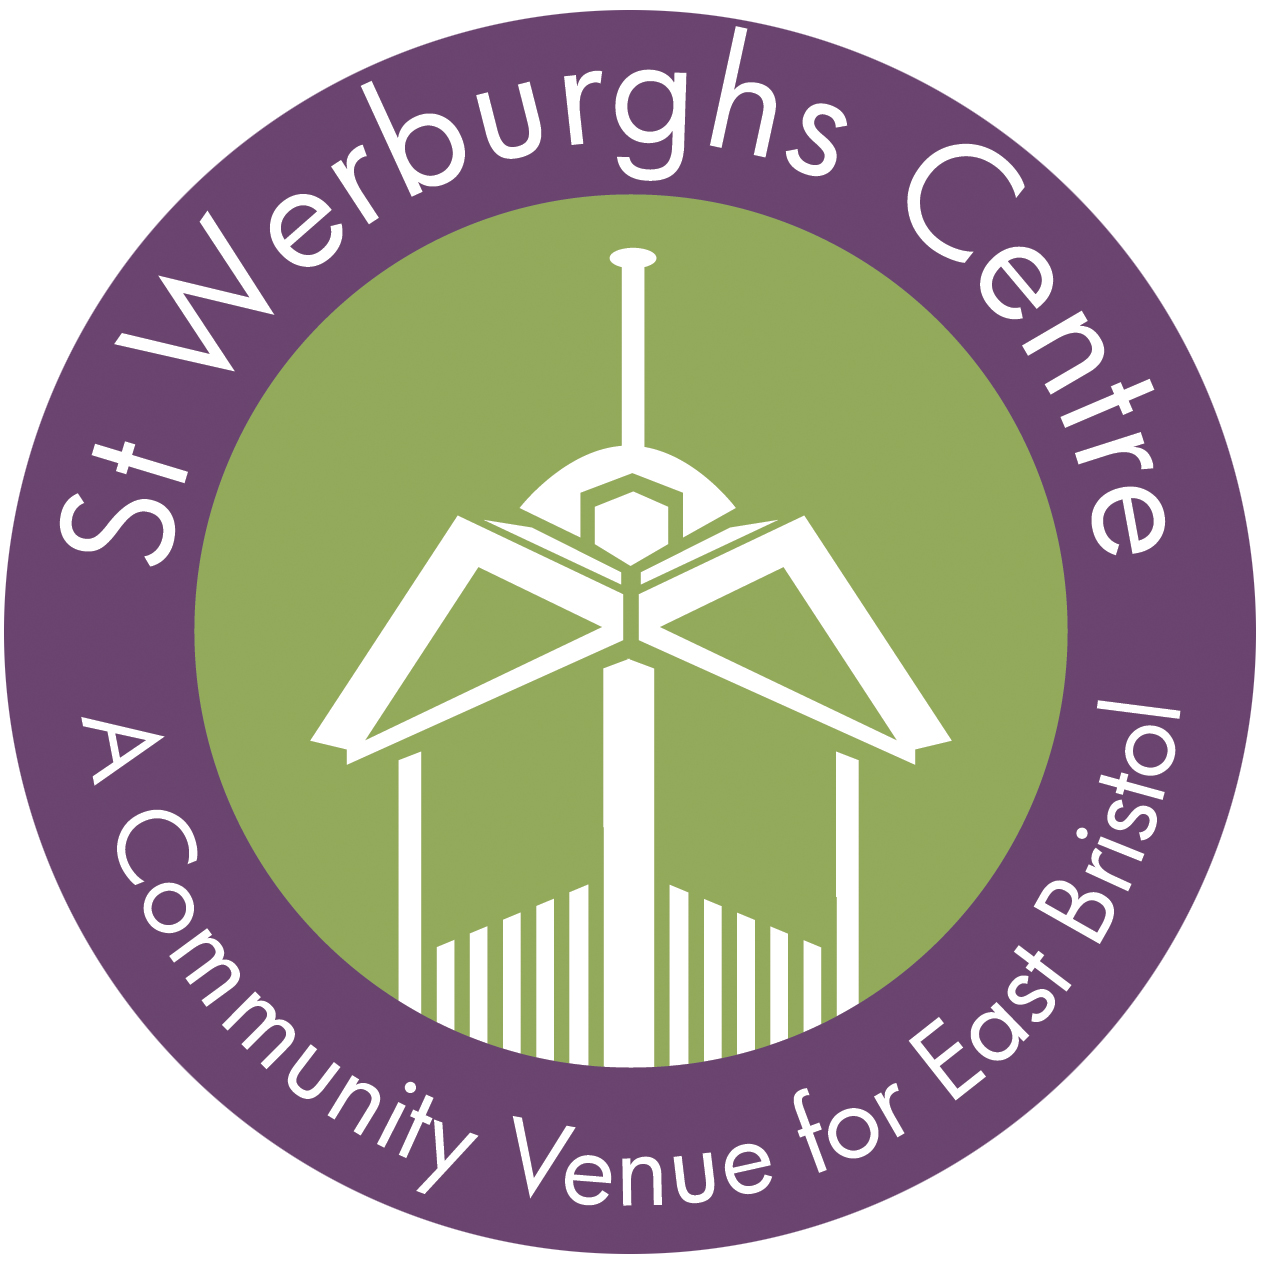 St Werburghs logo RGB without white background.png